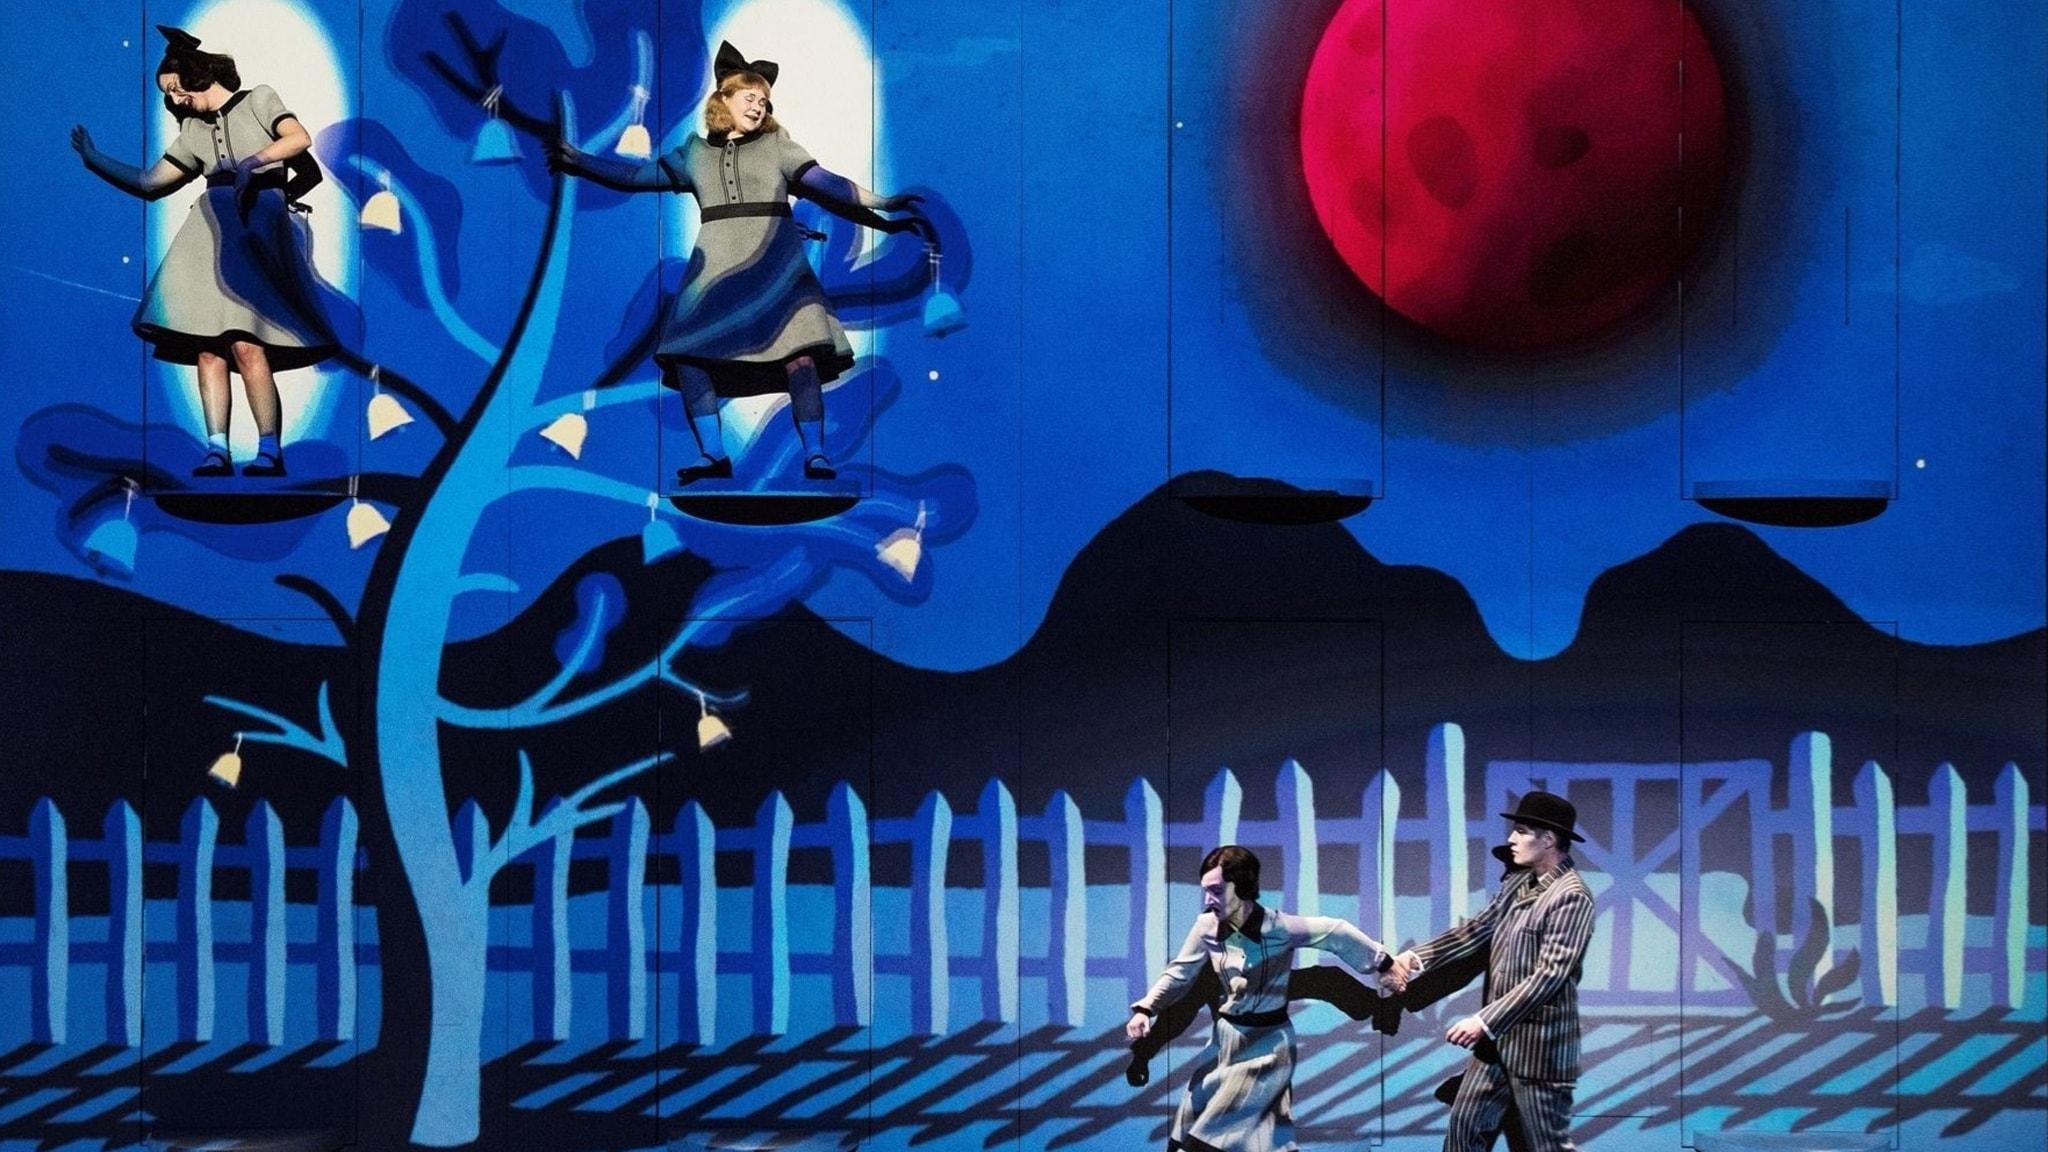 Det blåser på månen – en barnboksklassiker